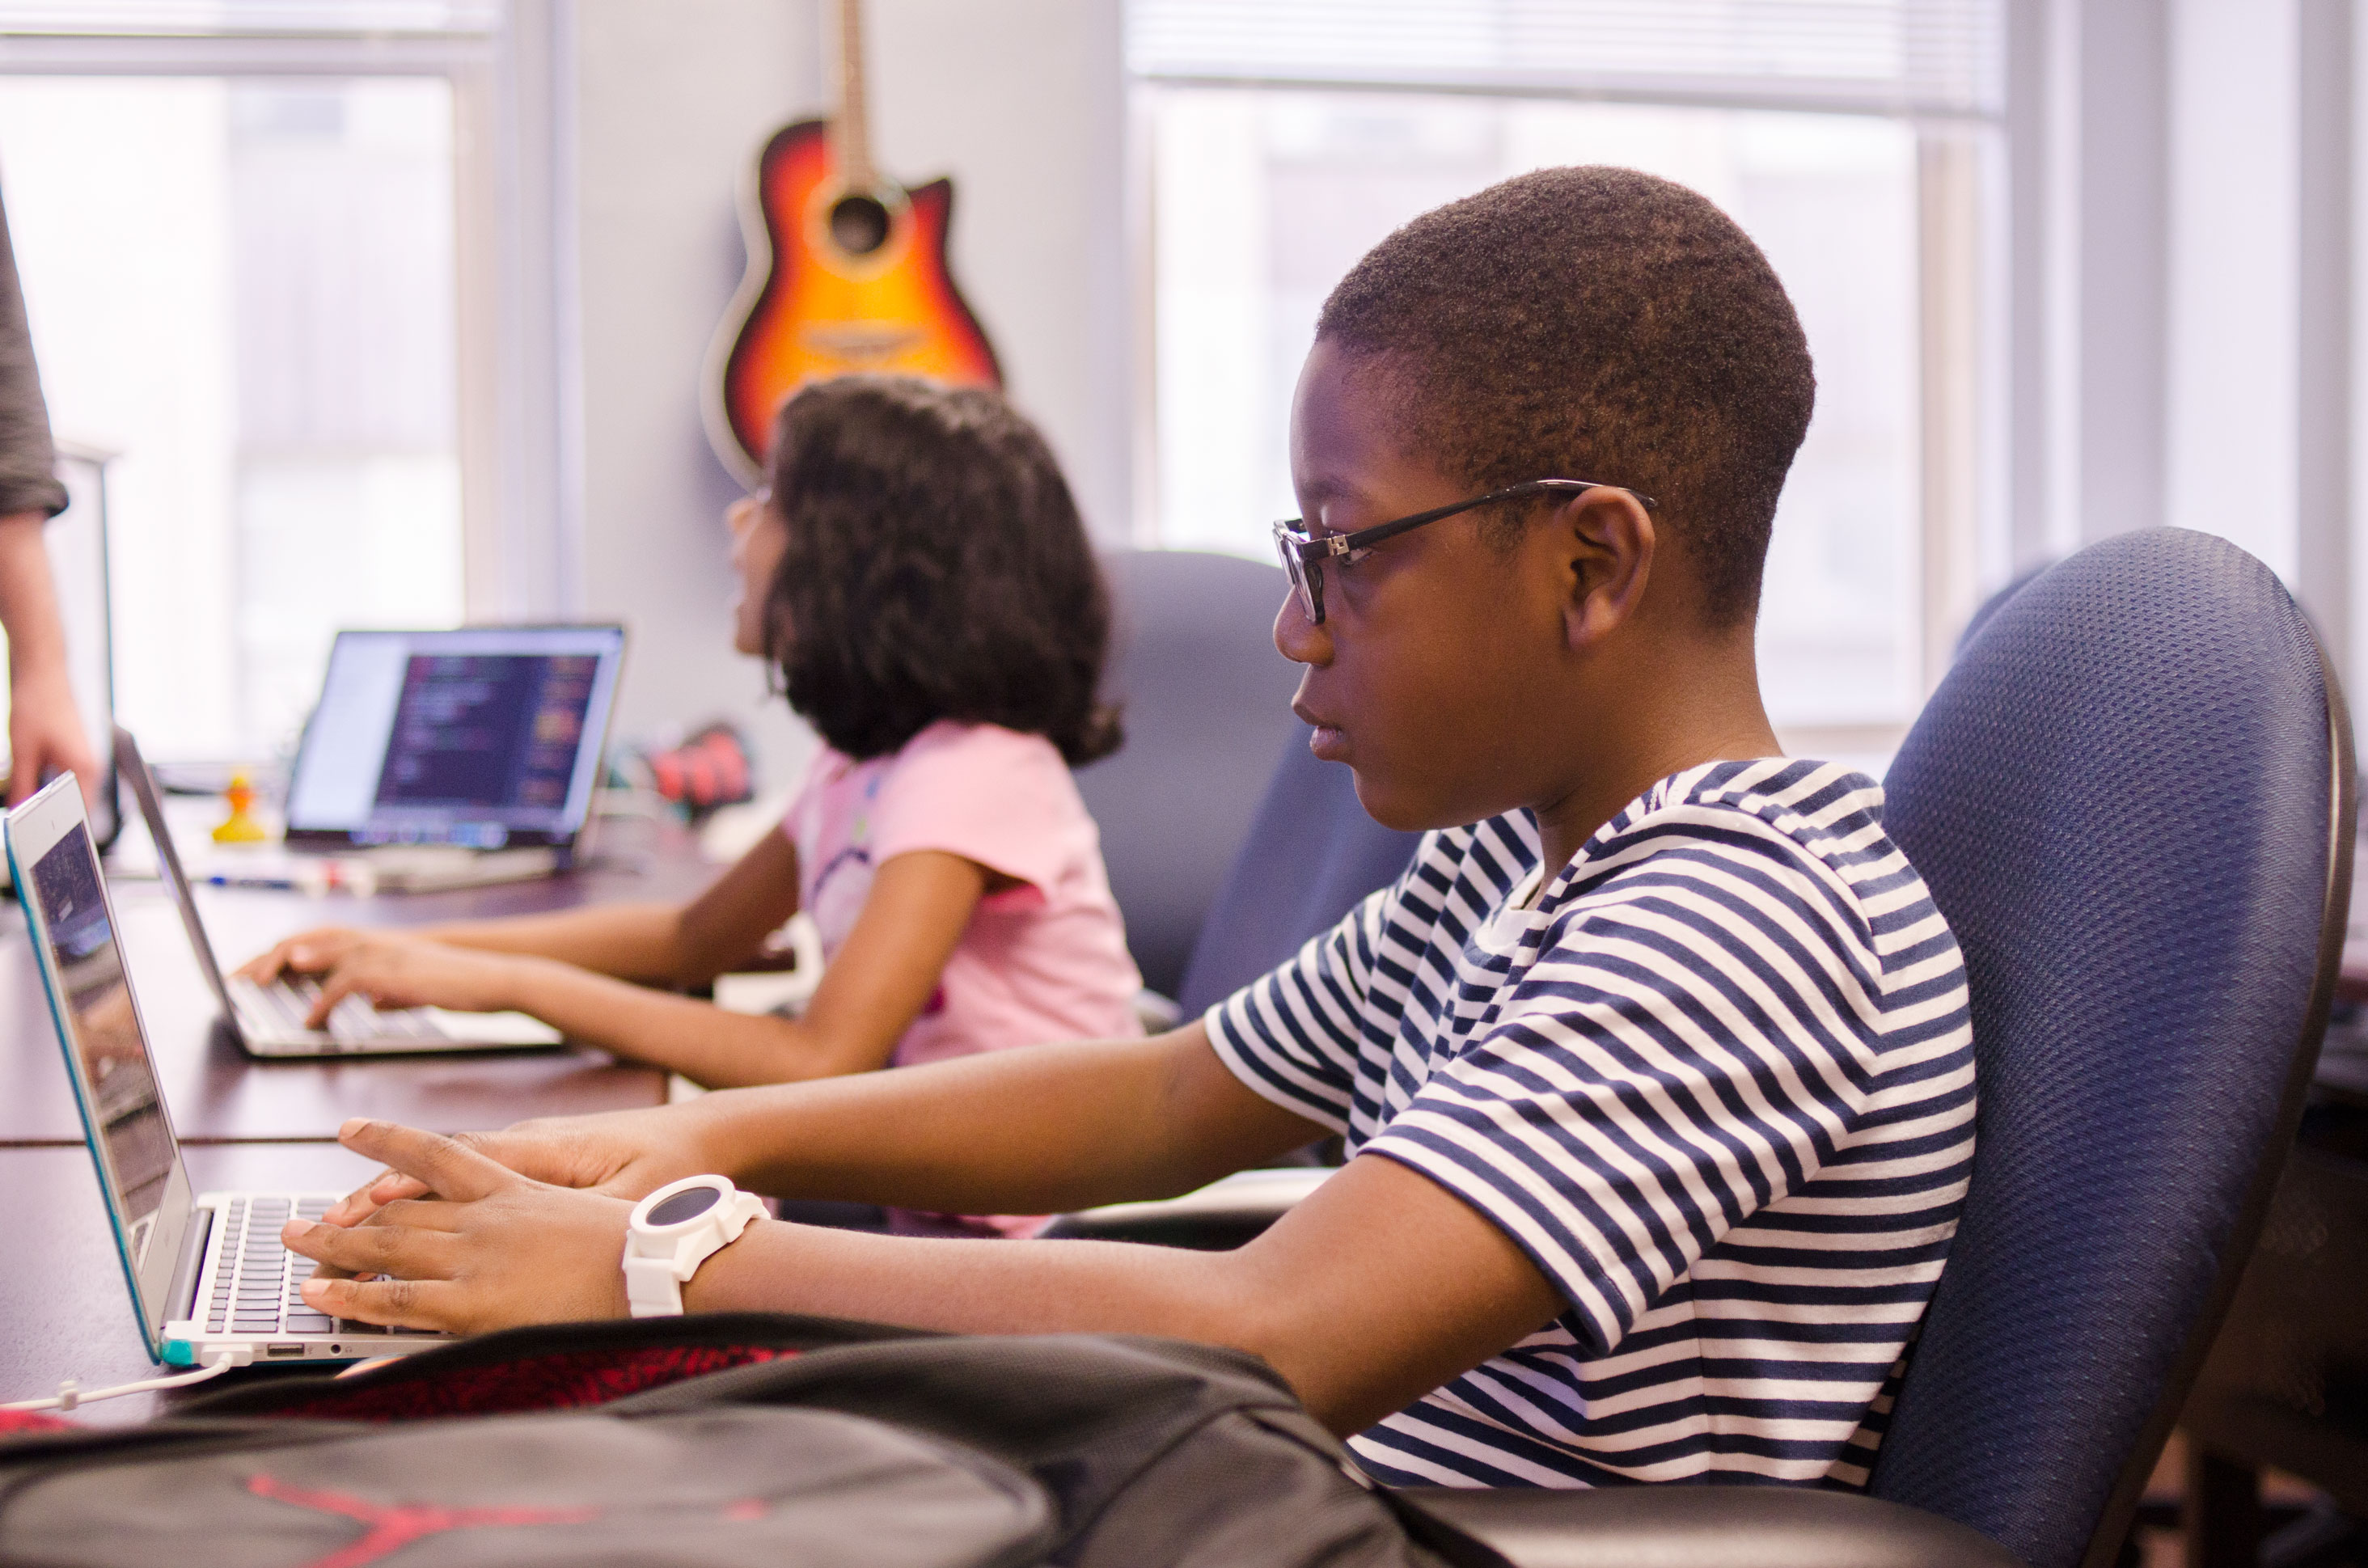 kids sharing sleek laptops at white table as teacher watches